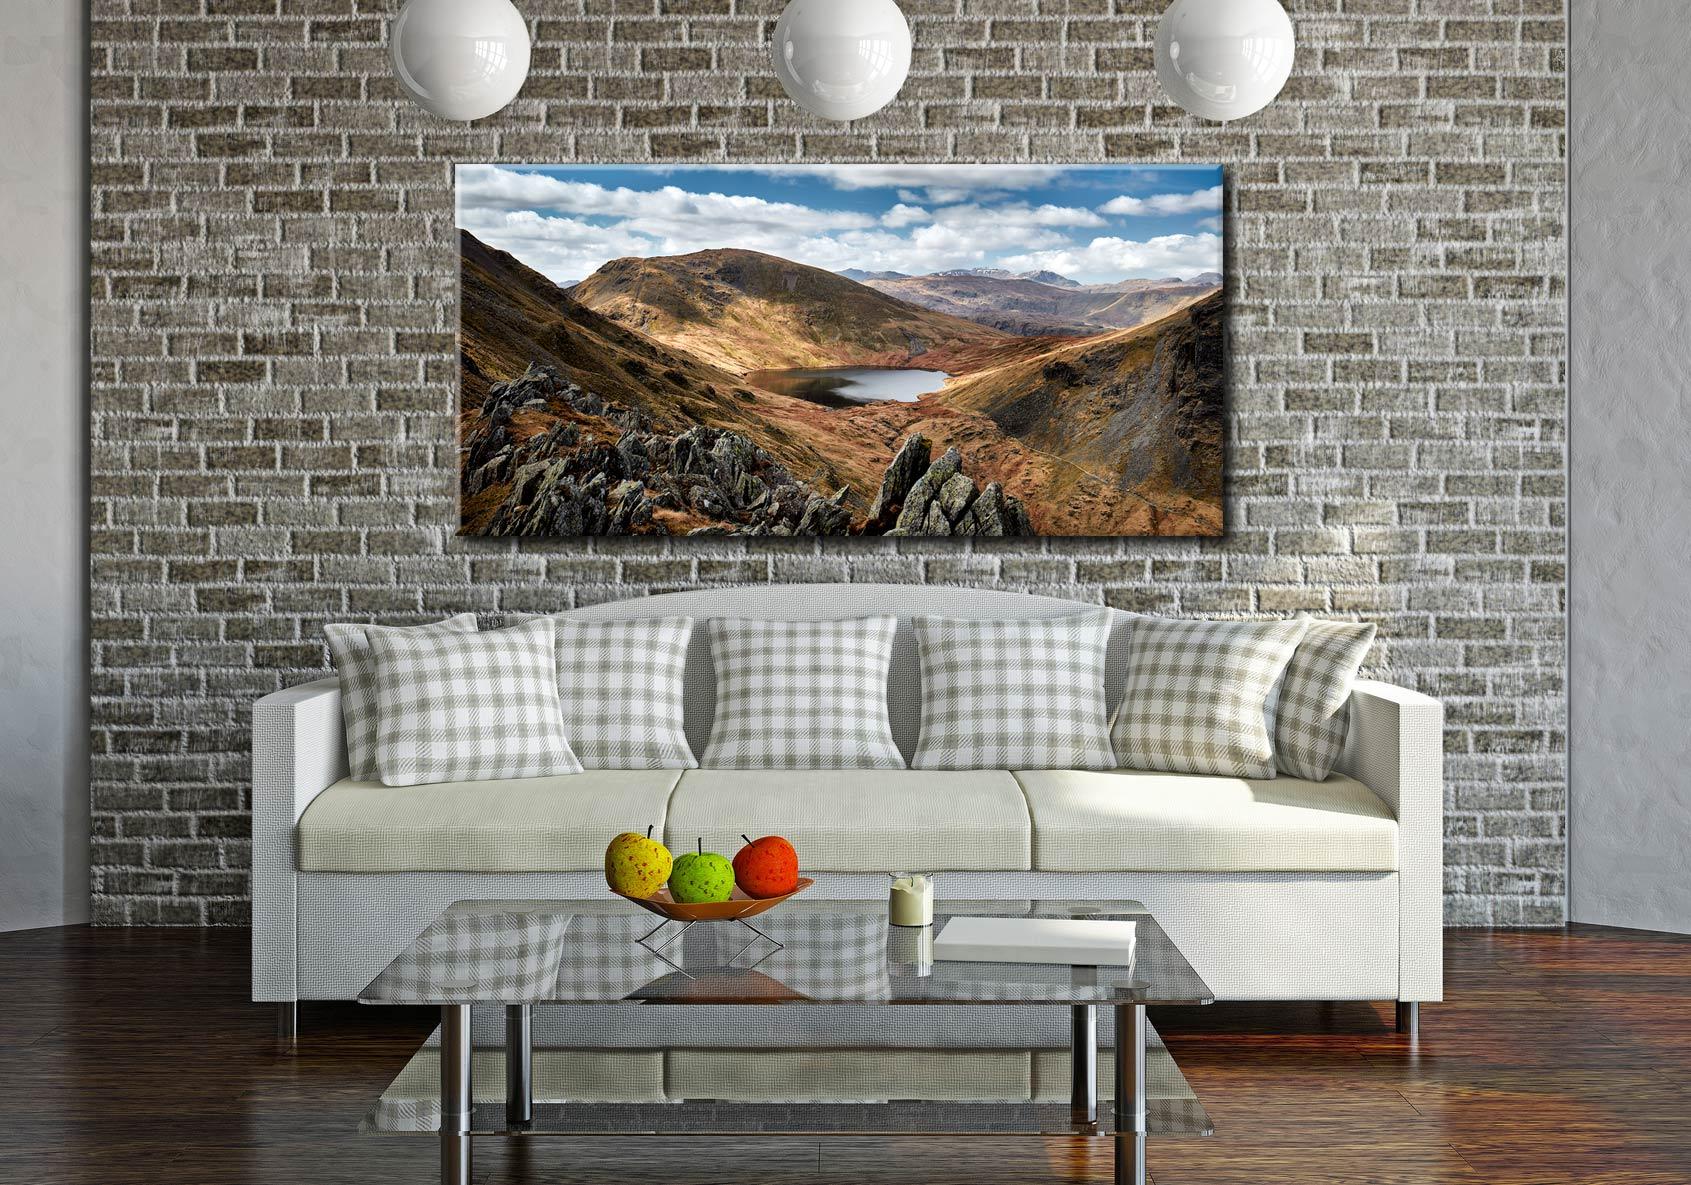 Grisedale Tarn Bowl - Canvas Print on Wall